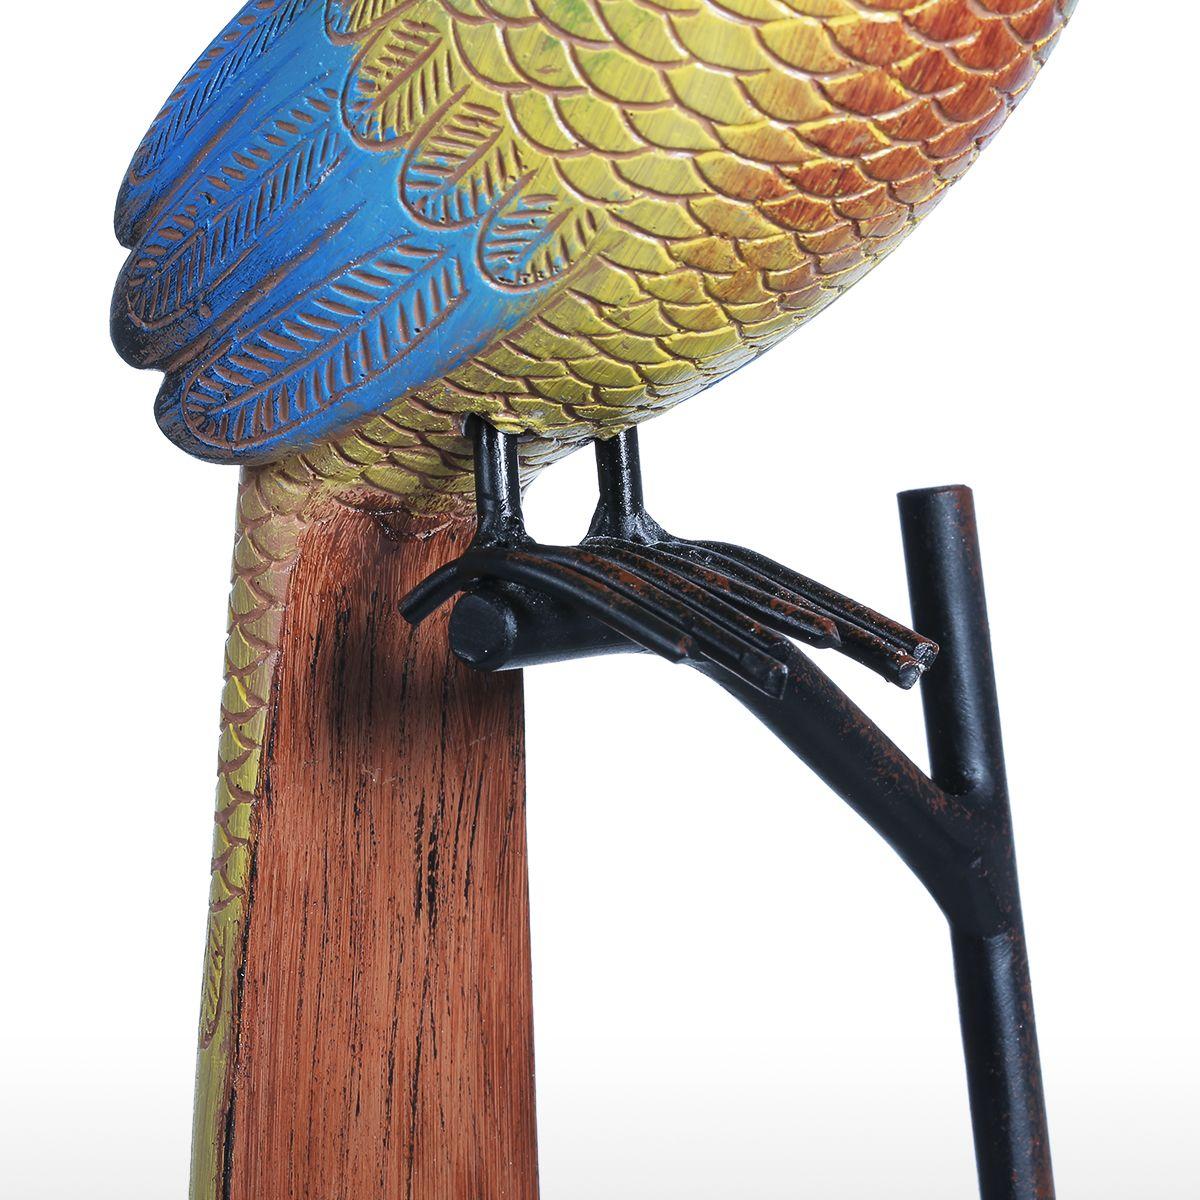 Nueva escultura de resina de pájaro de cola larga, adorno de fibra de vidrio, estatua de decoración interior, figurita exagerada abstracta, arte moderno